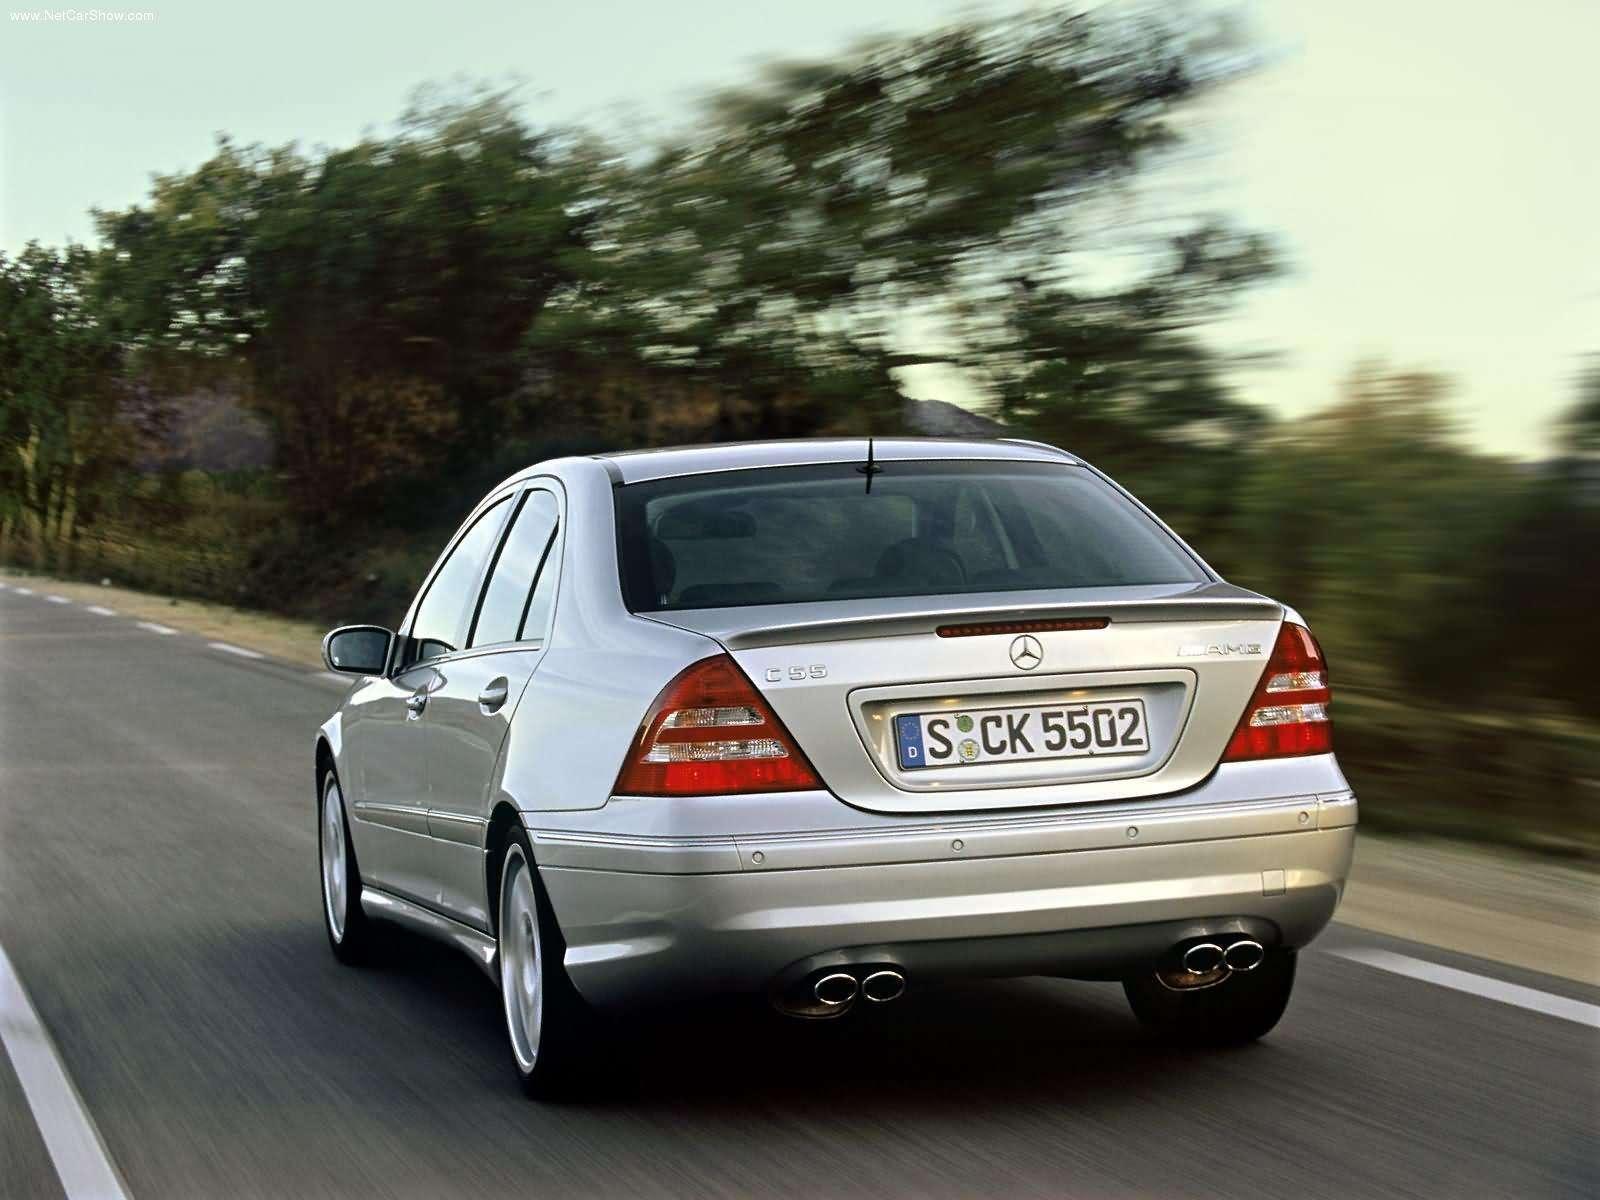 Mercedes-Benz C-klasse AMG II (W203) Restyling 2004 - 2007 Sedan #1